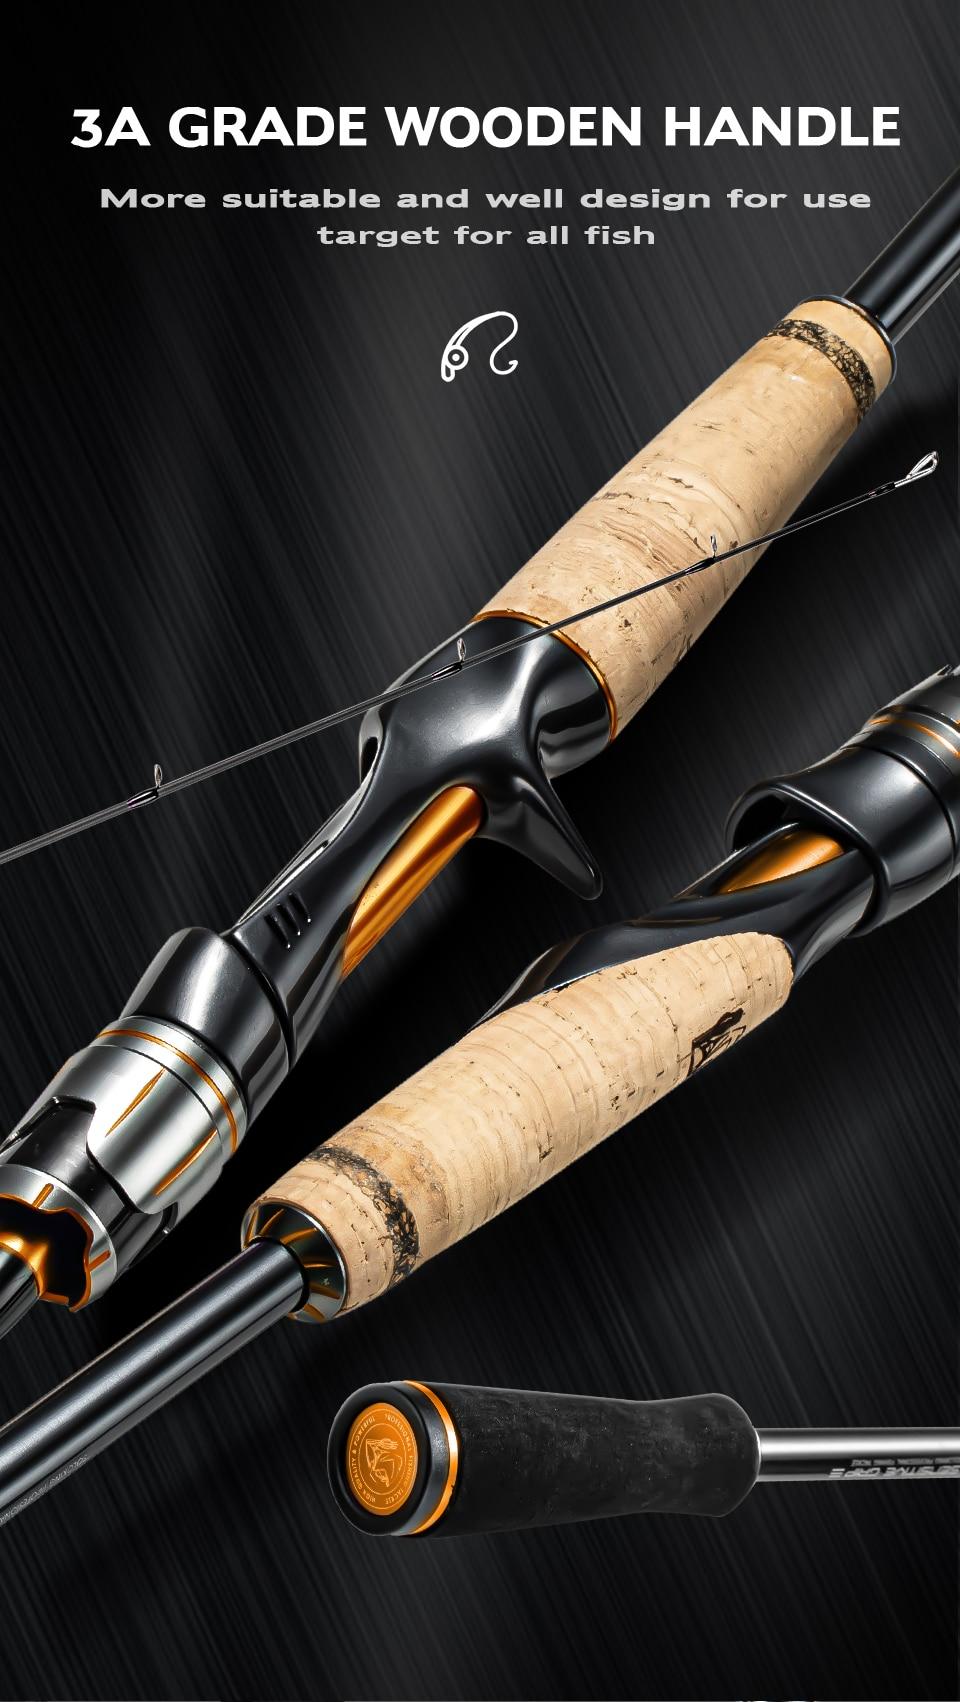 Soloking Fishing Rod and Reel Kit 2.4M High Carbon Lure Casting Rod GKA200T Baitcasting Reel Red Blue Orange Purple Fishing Kit enlarge